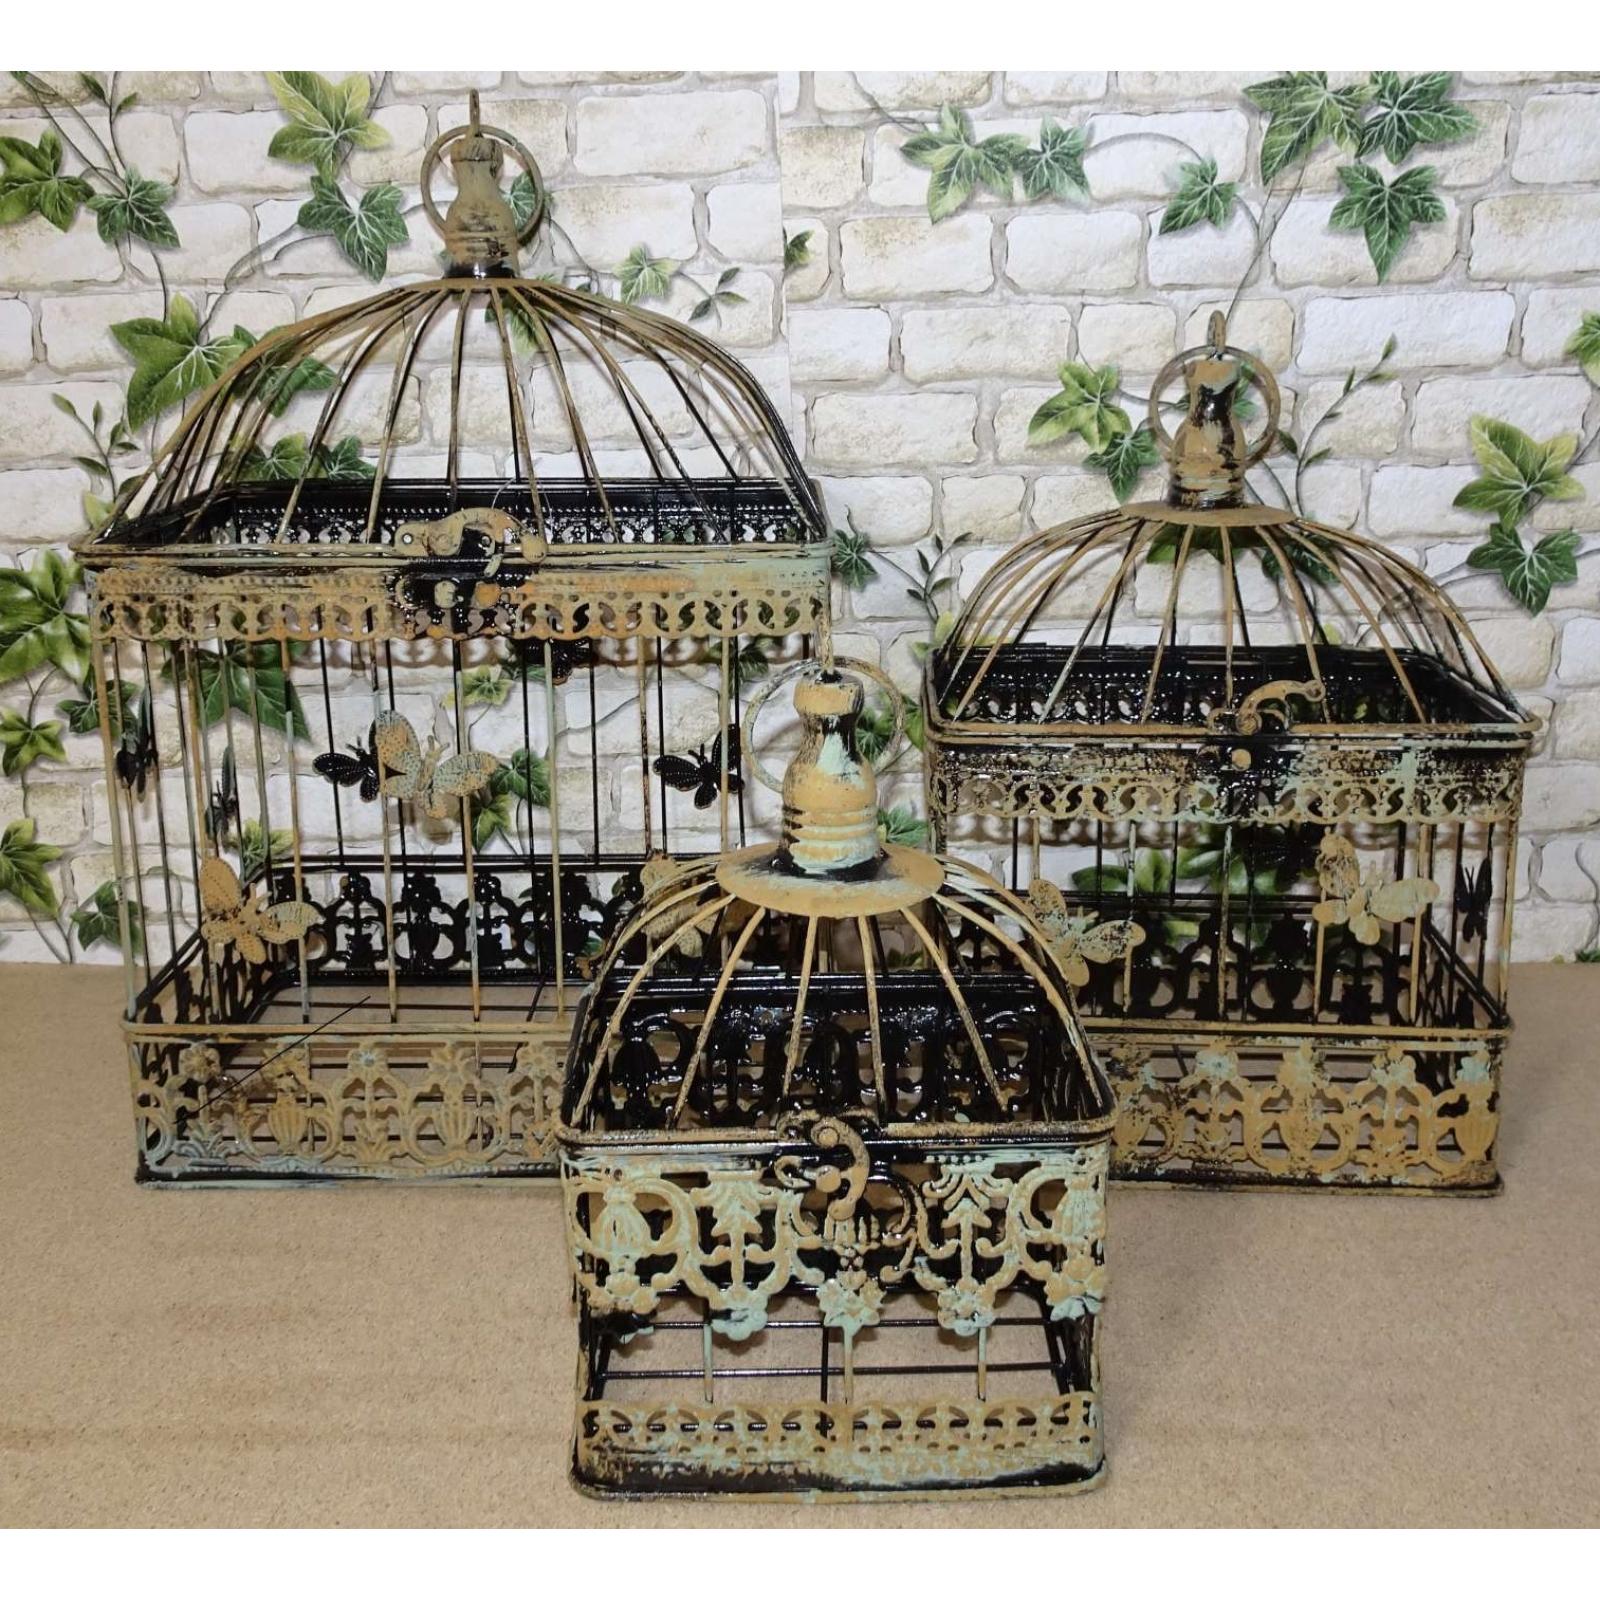 3er Set Bird Cage Antique Green Brown Iron Plants Flowers Decor